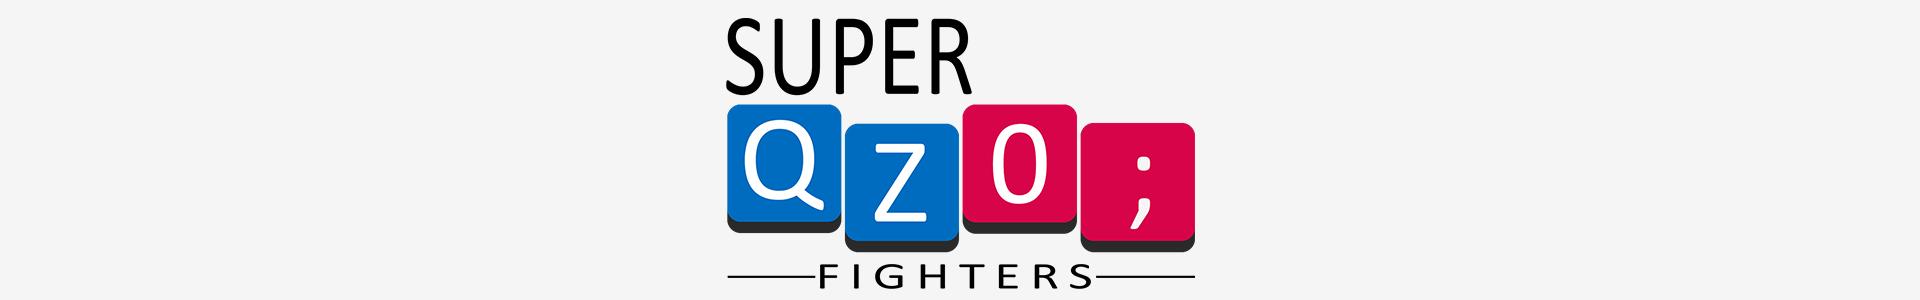 Super QZ0; Fighters - Ragdoll 1vs1 fighting game